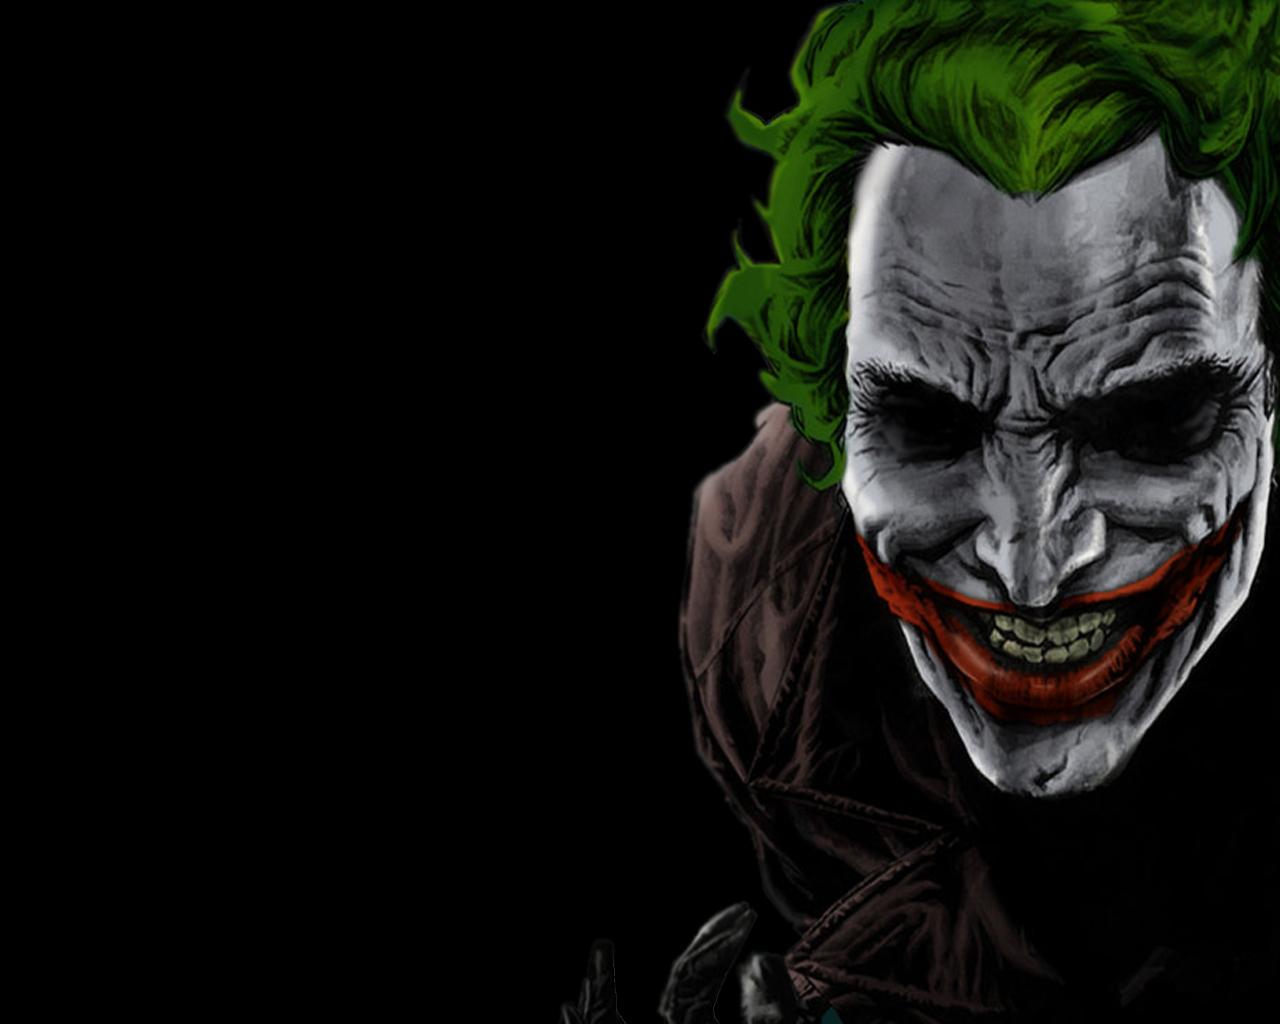 joker   the joker Wallpaper fanpopcom 1280x1024